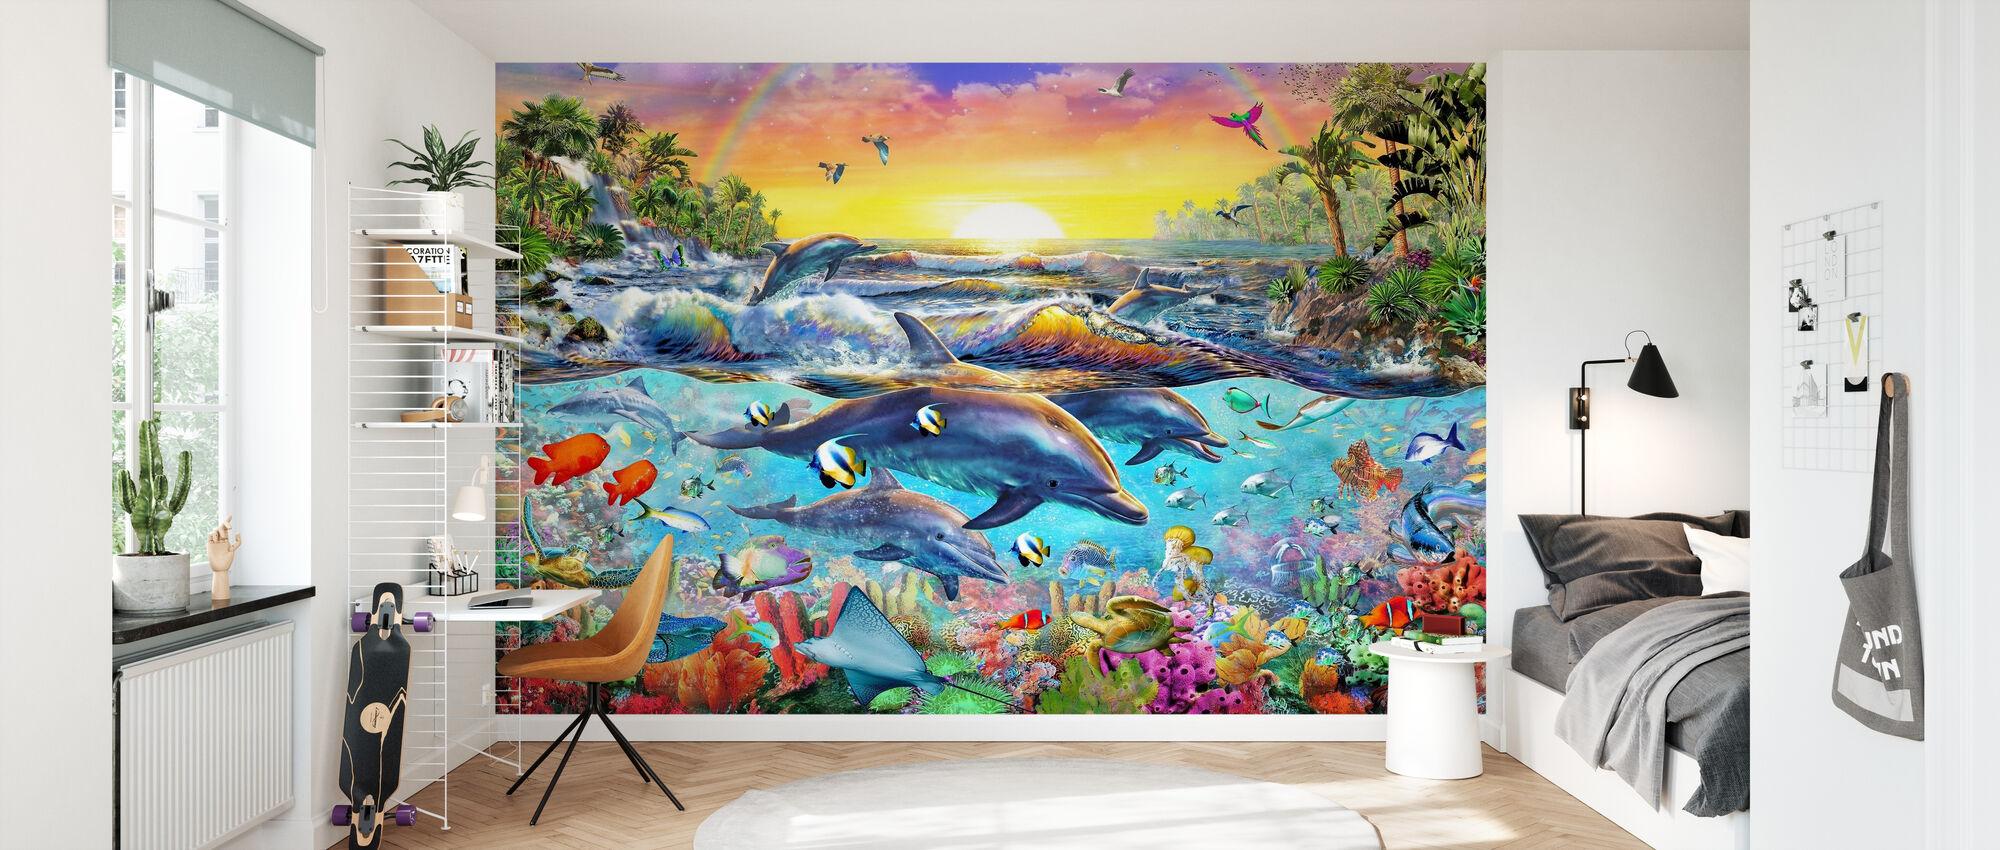 Tropical Cove - Wallpaper - Kids Room